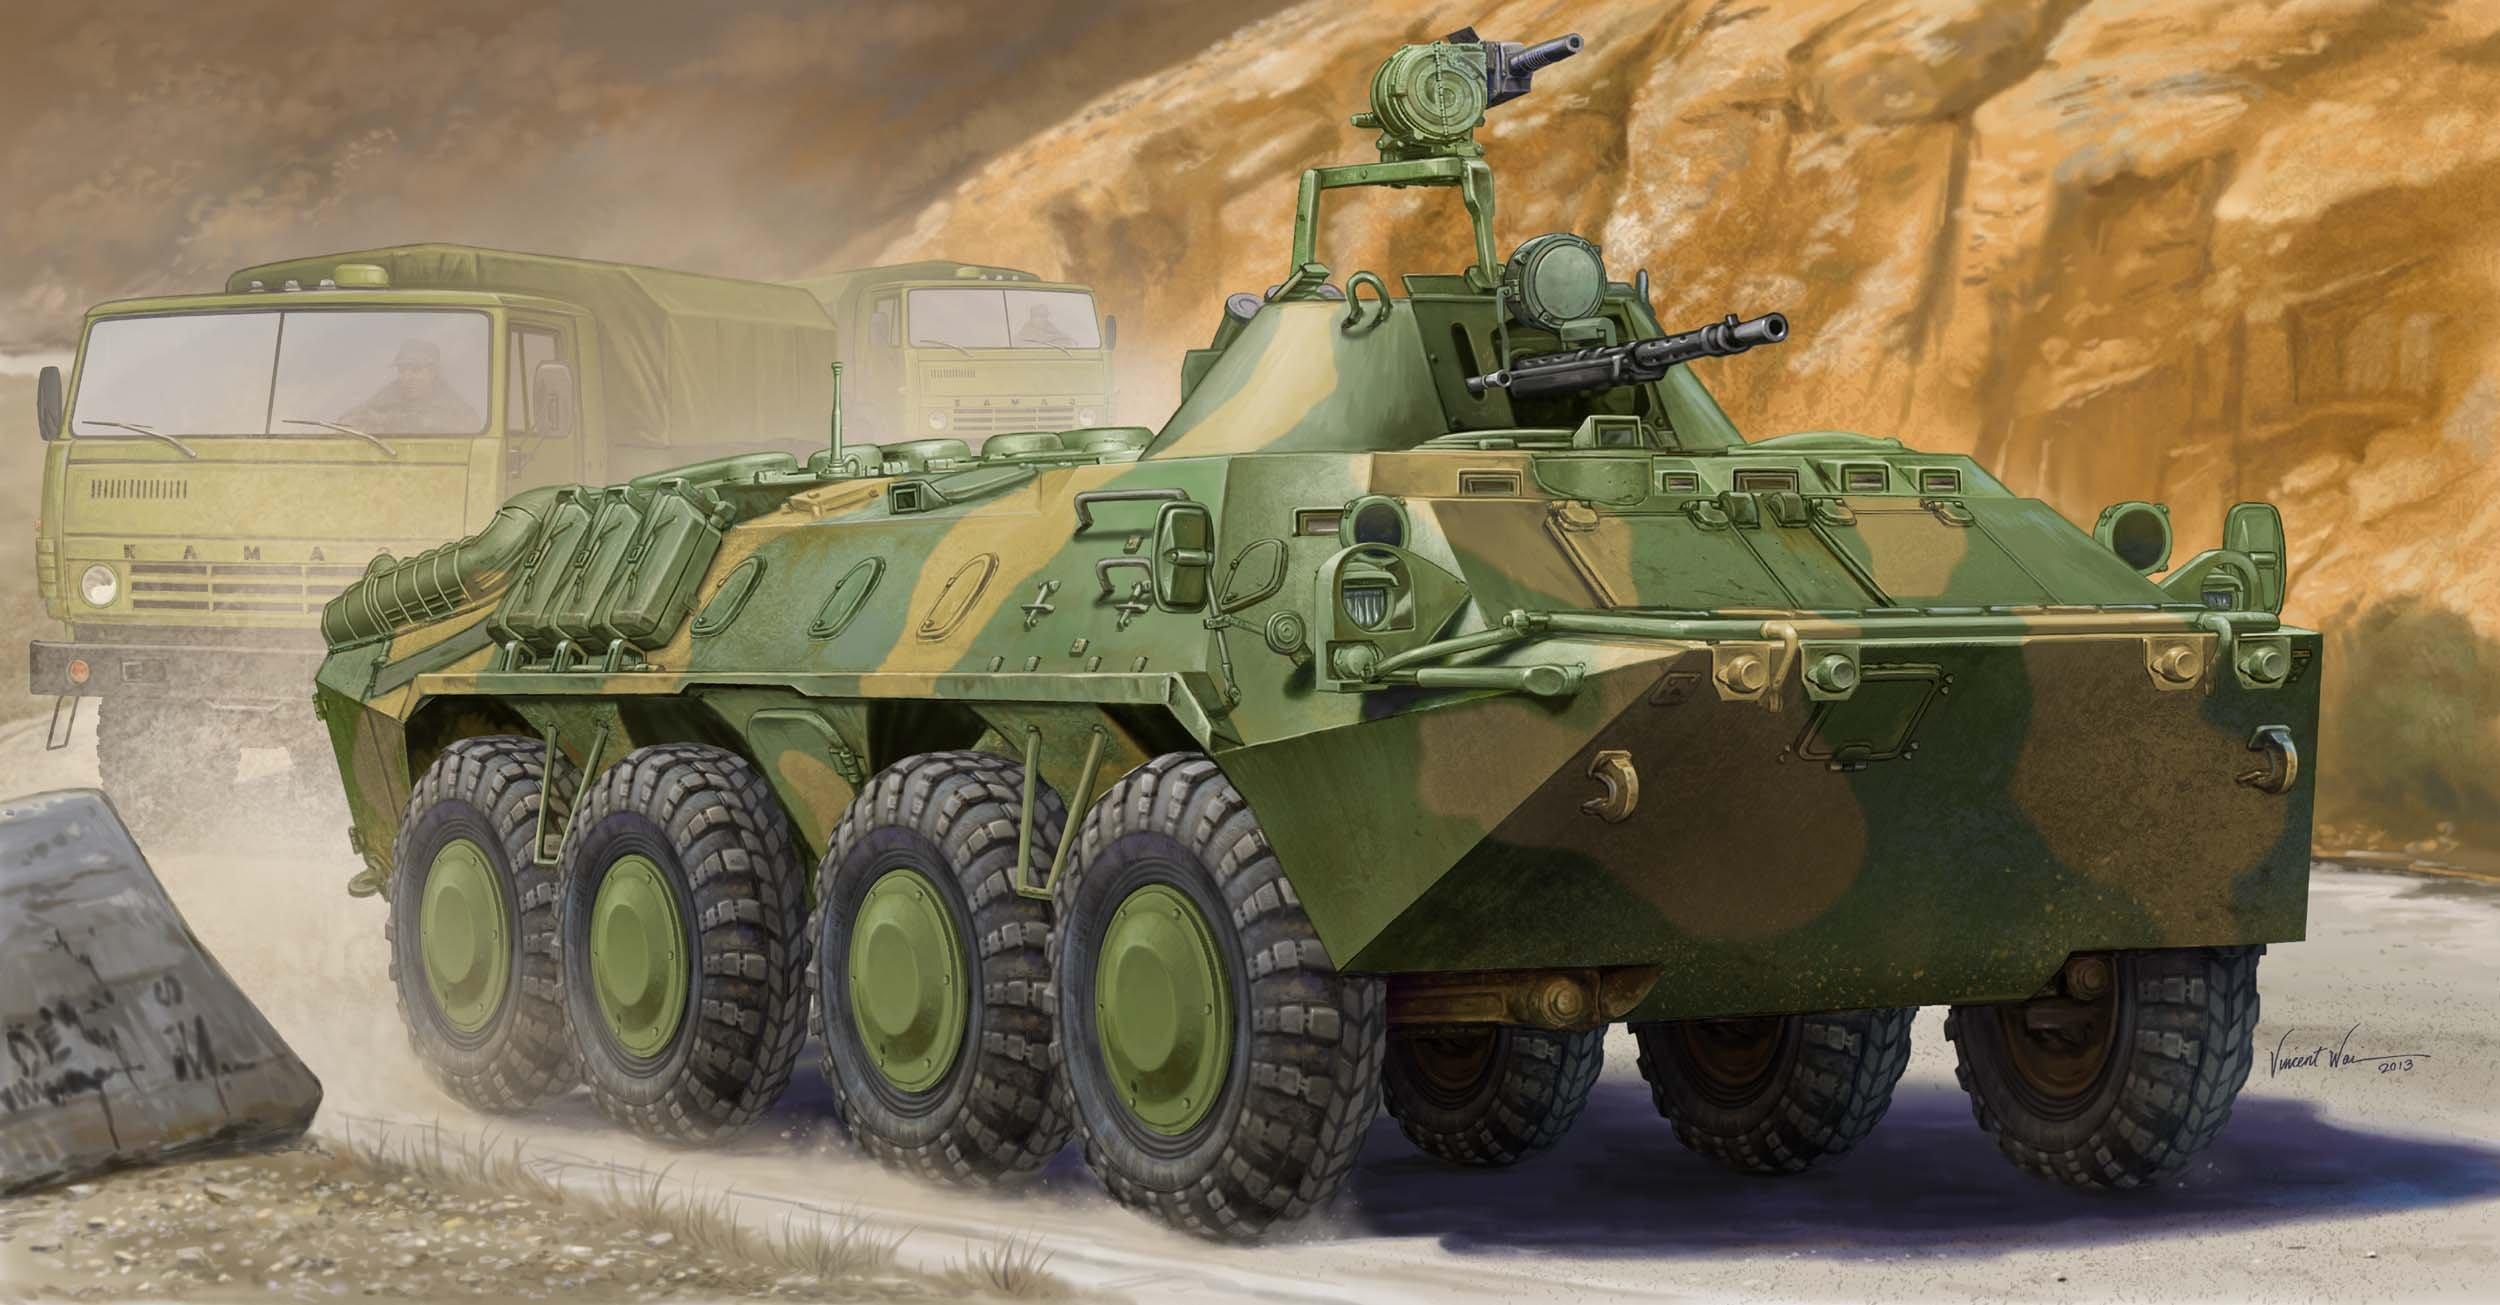 Trumpeter Russian BTR-70 APC in Afghanistan Model Kit (1:35 Scale)